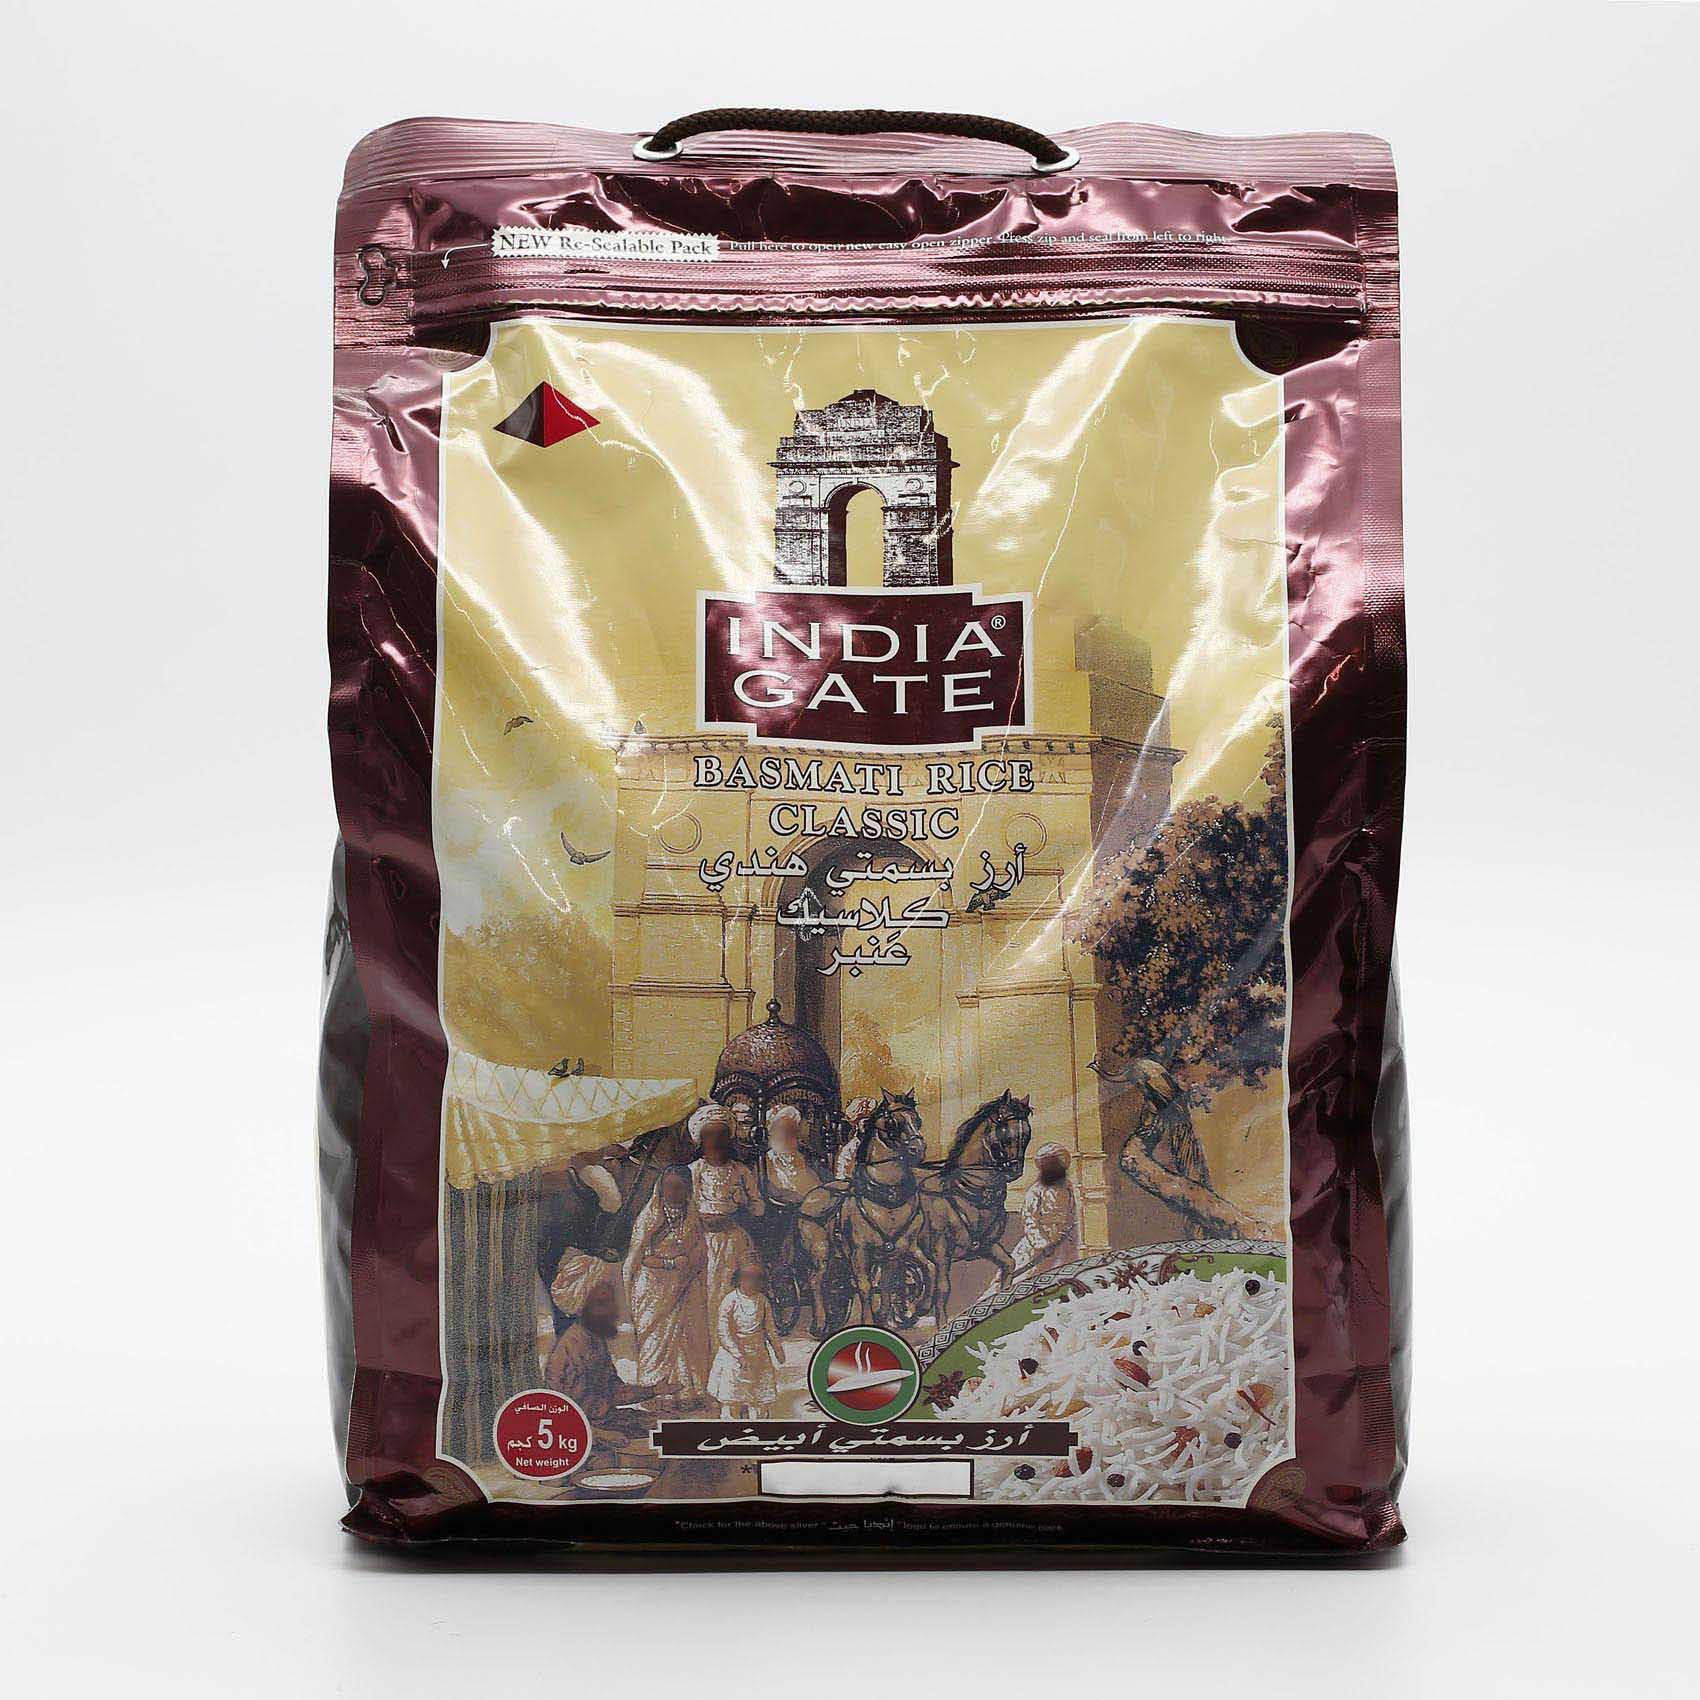 Buy India Gate Basmati Rice Classic 5 Kg Online Shop Food Cupboard On Carrefour Saudi Arabia